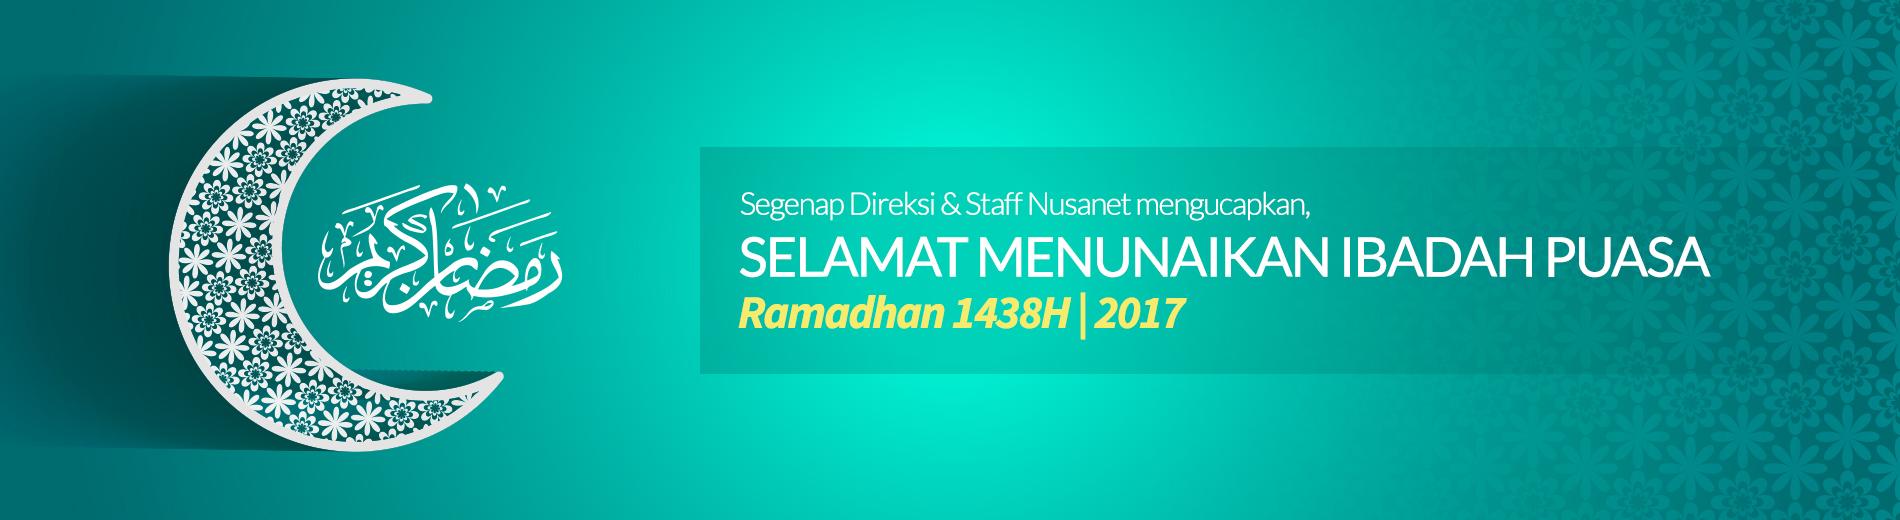 banner-ramadhan-2017-nusanet